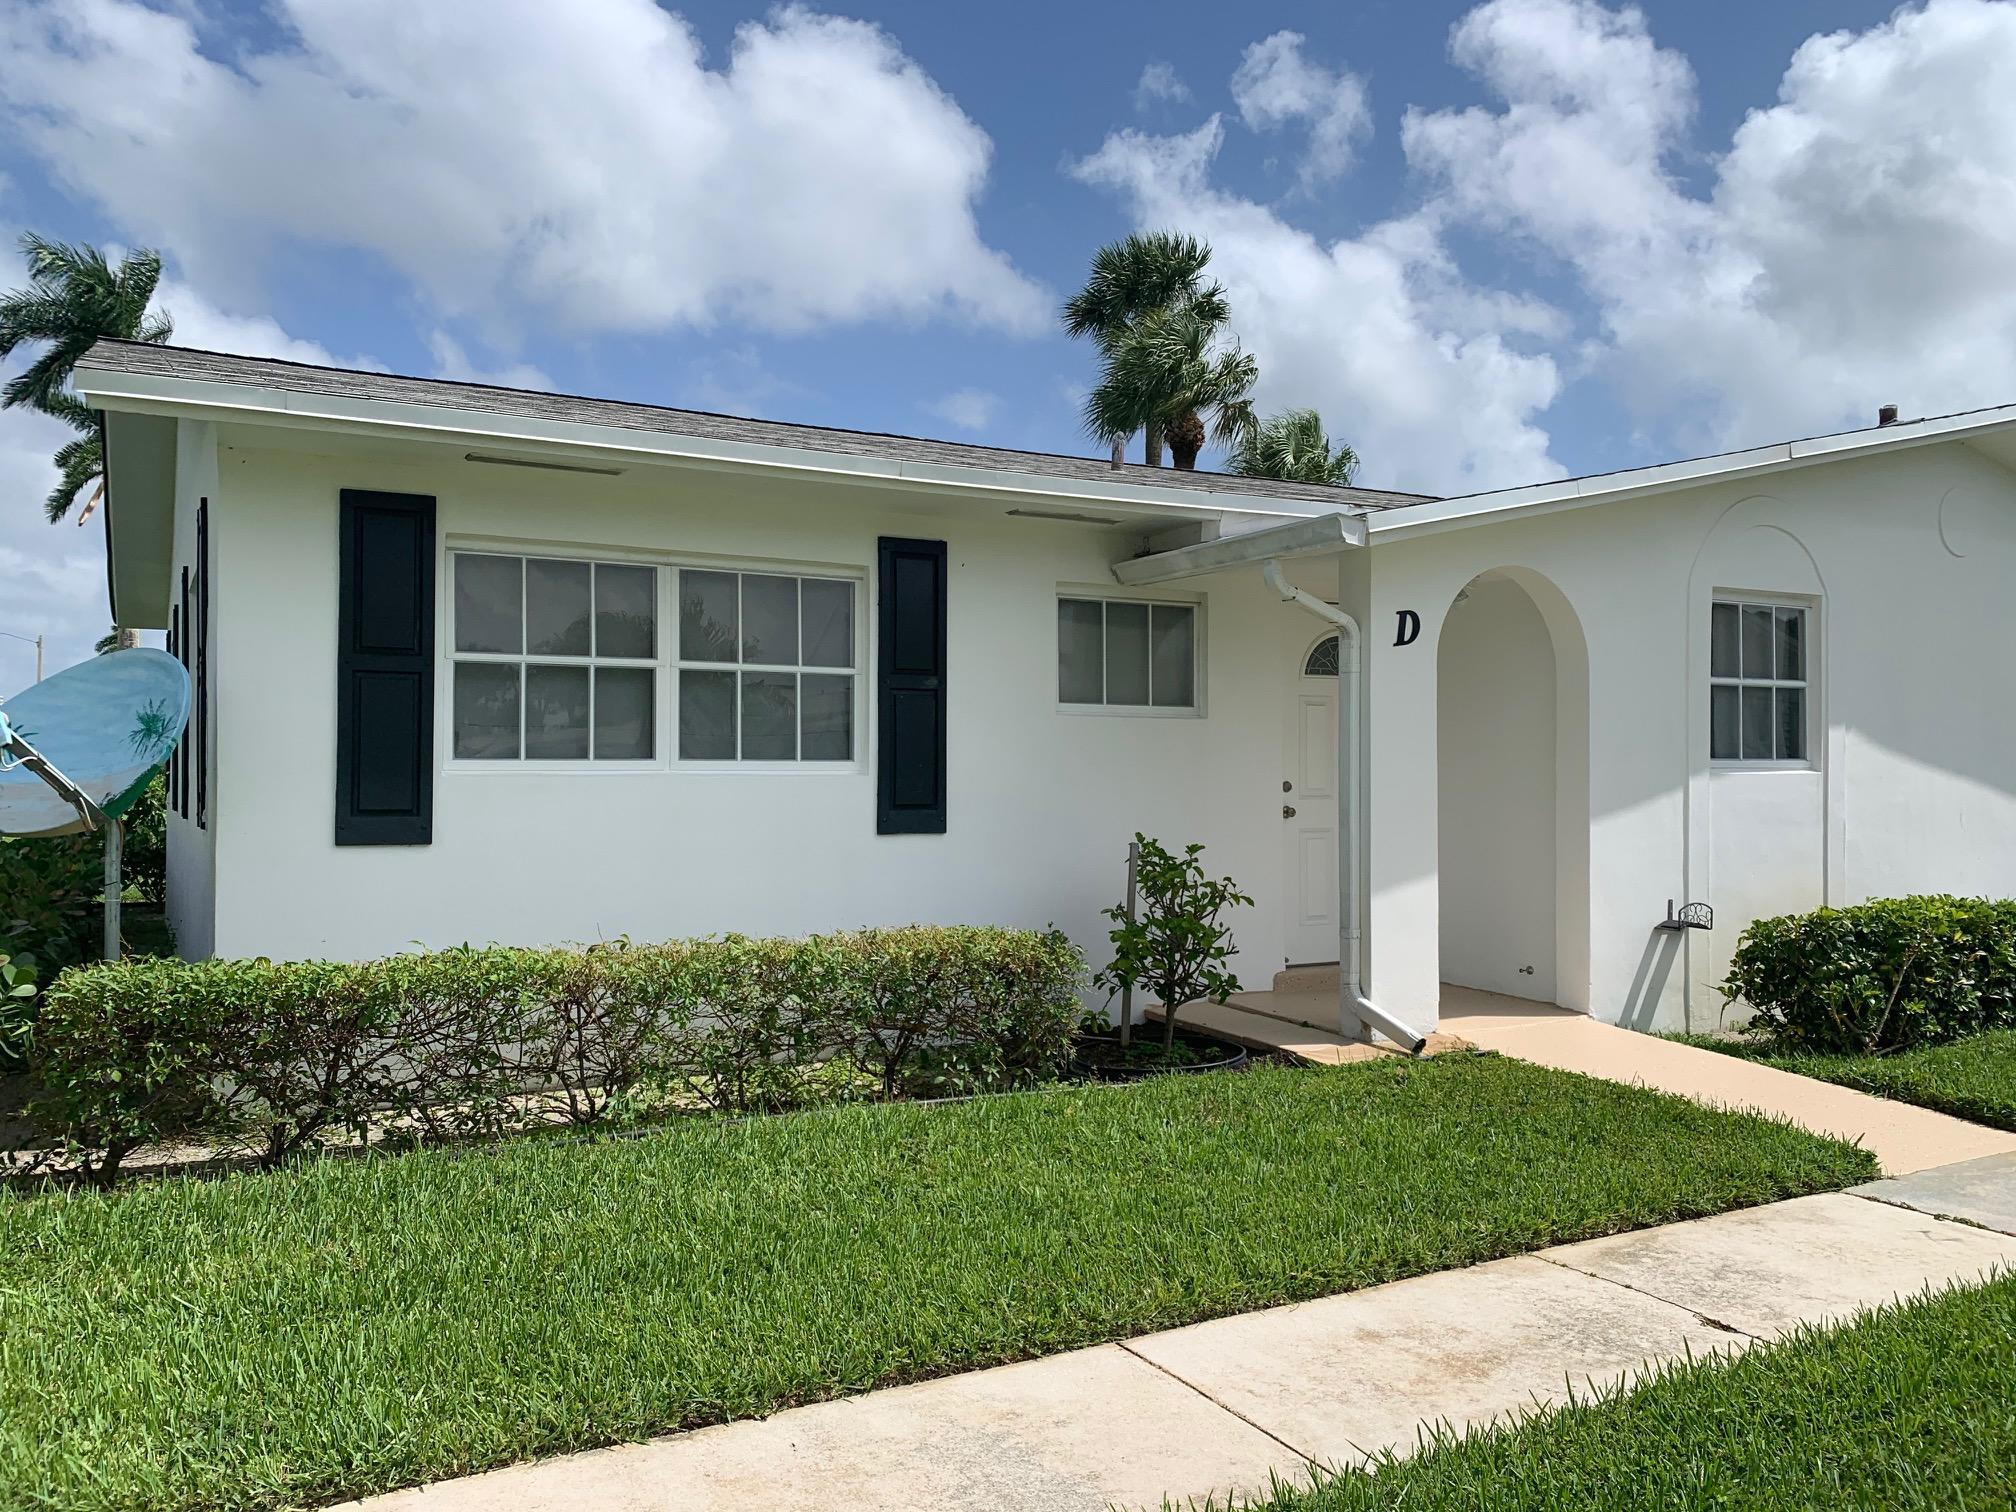 2946 Crosley Drive E, D, West Palm Beach, FL 33415